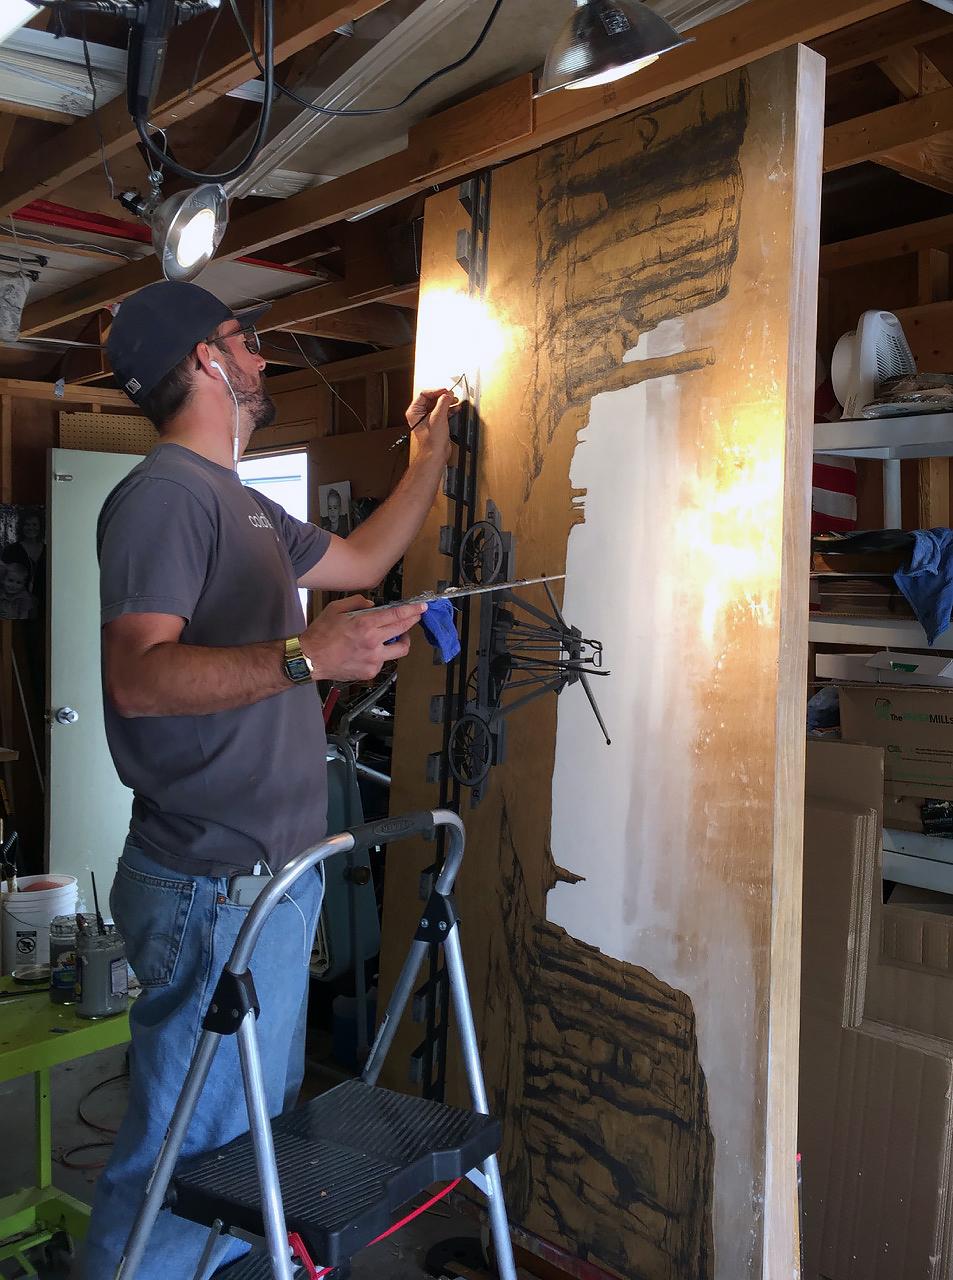 Garage studio - no heat, ac, or insulation | Fort Collins, CO